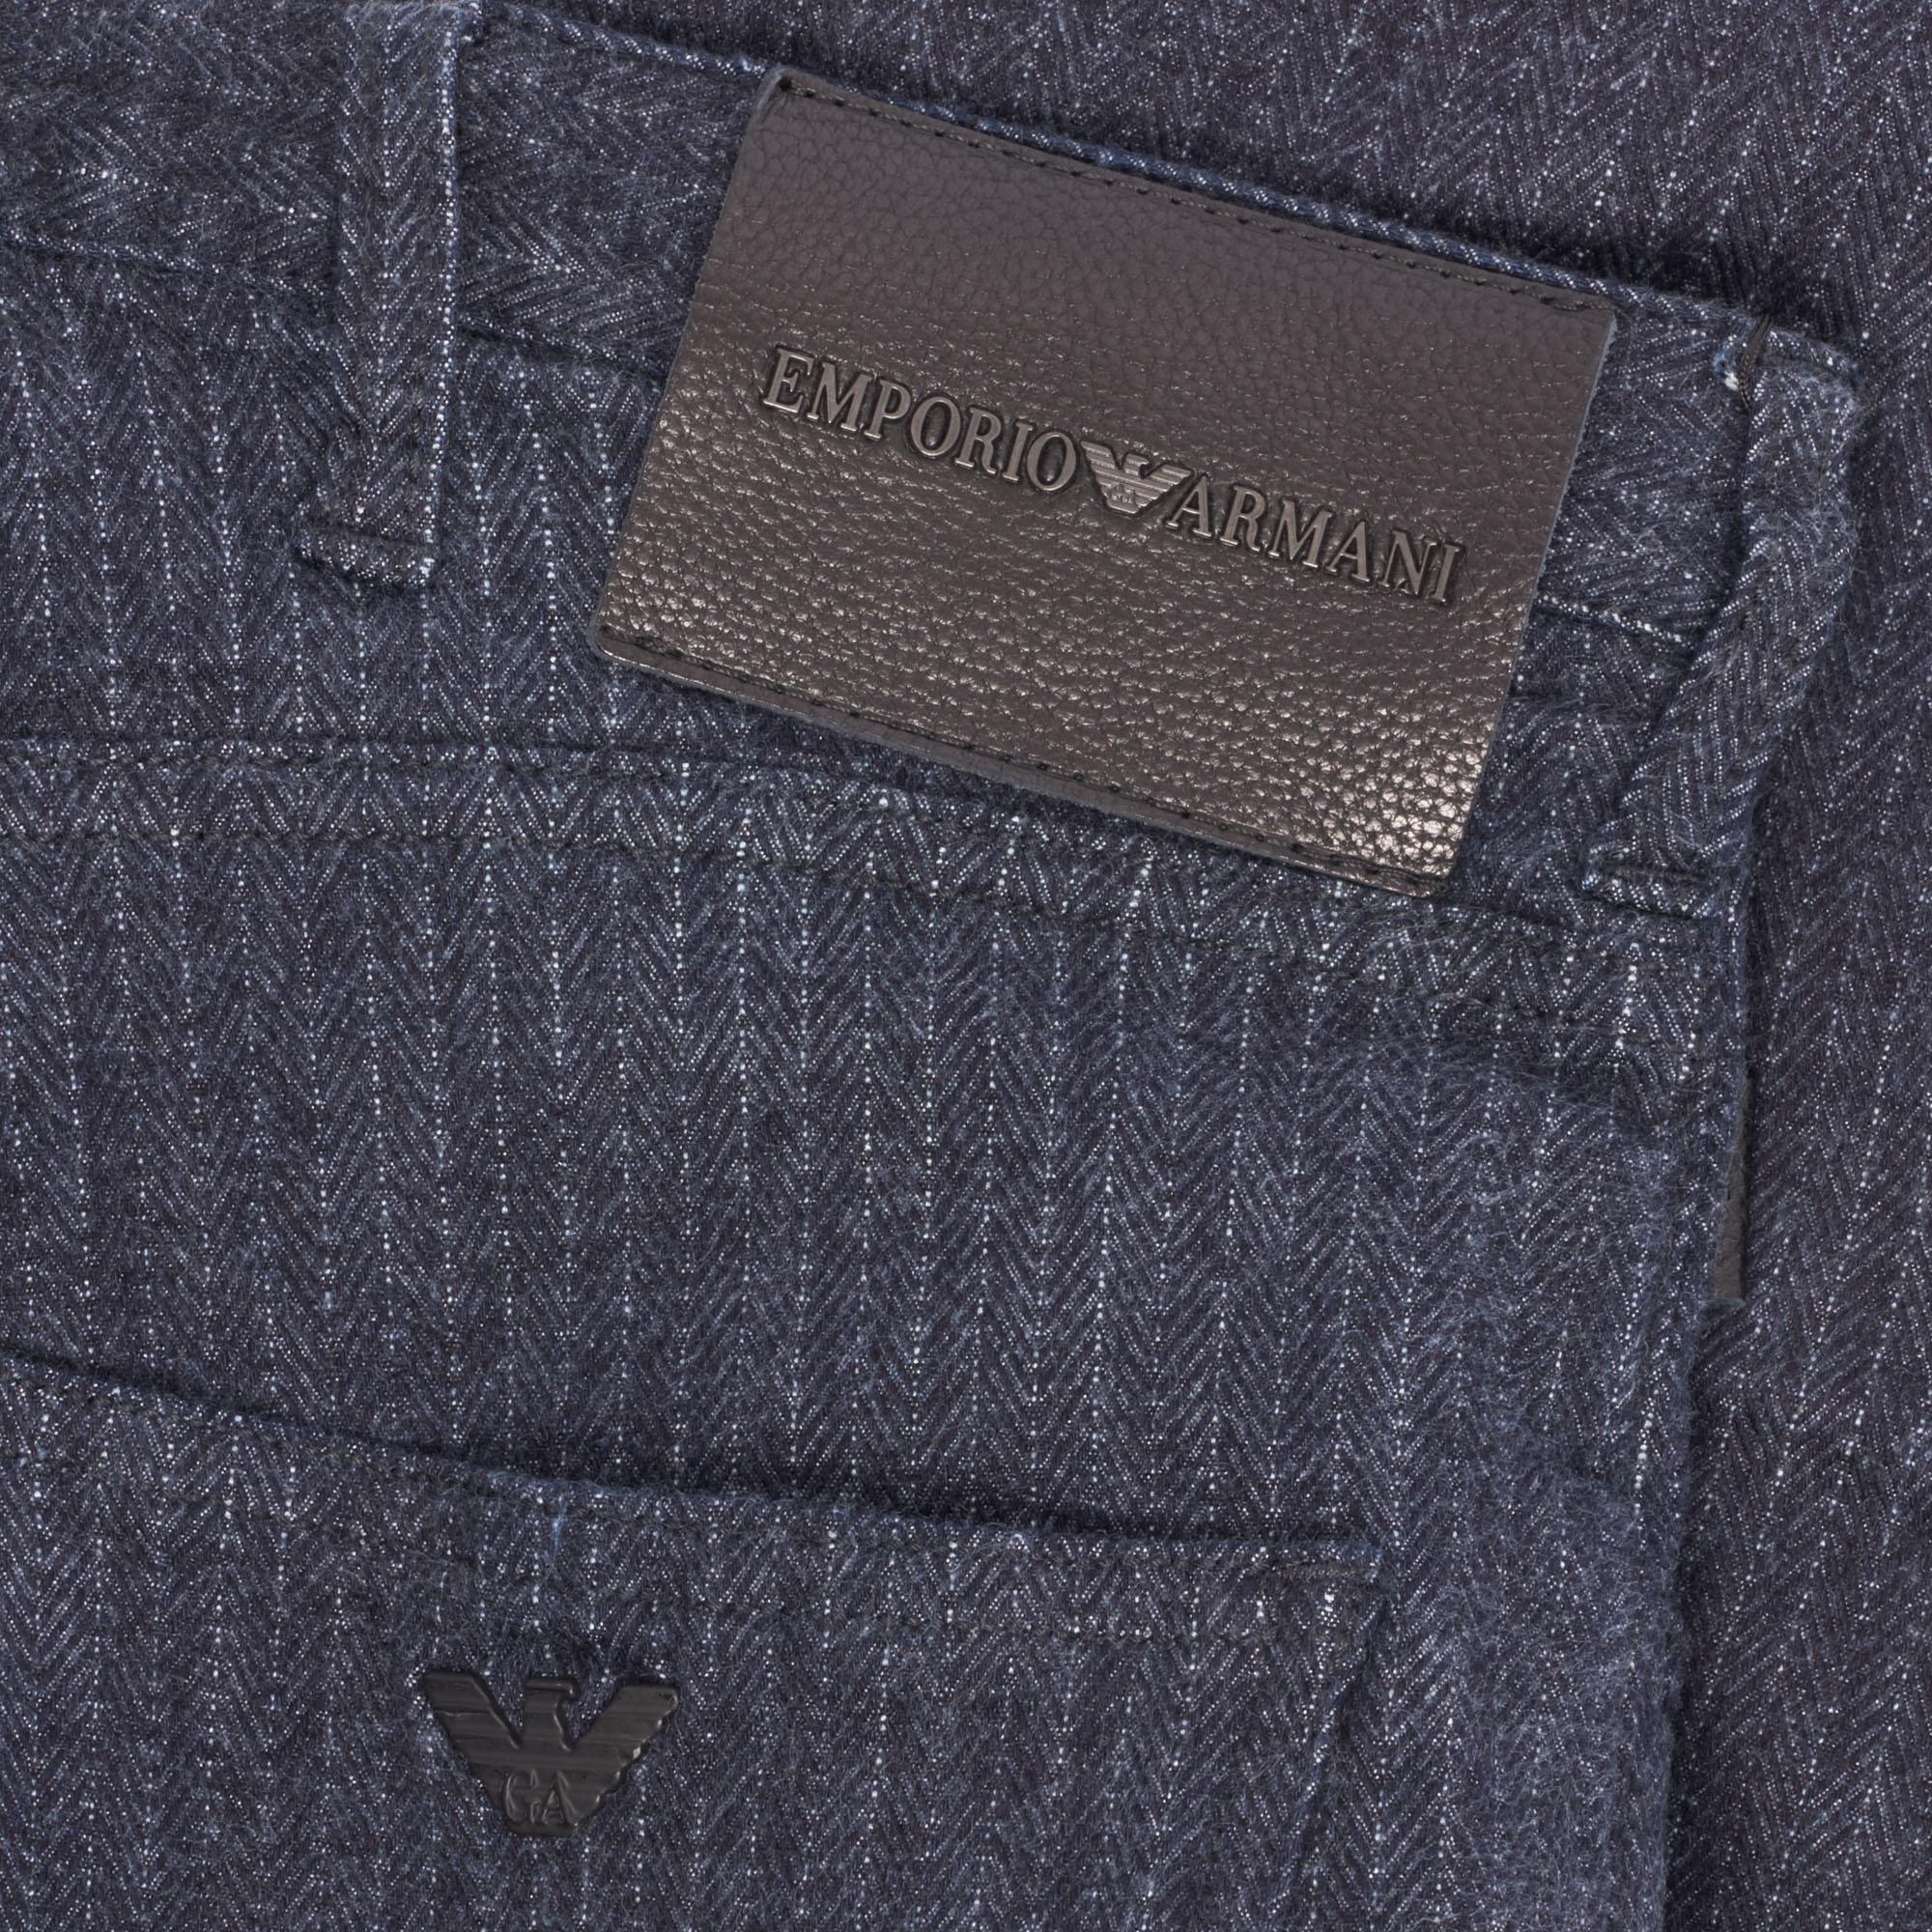 bfffaca5d2 Emporio Armani J04 Loose Fit Striped Jean in Blue for Men - Lyst